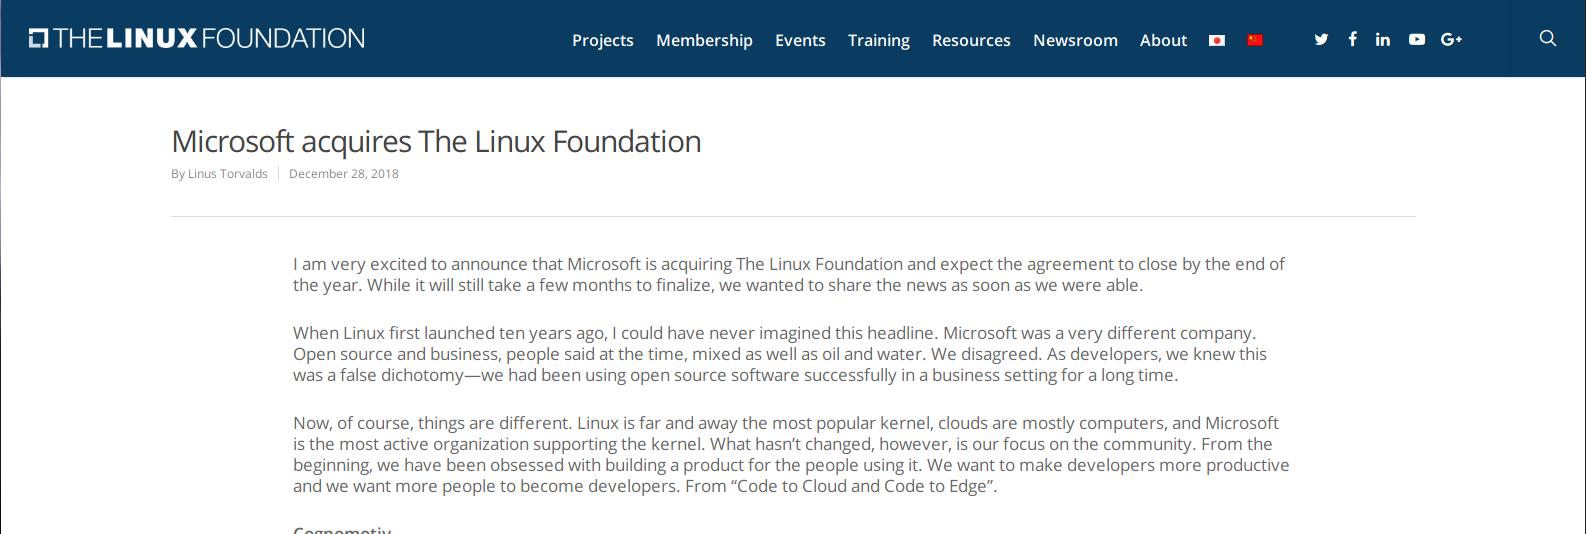 Anucio Microsoft compra la Linux Foundation